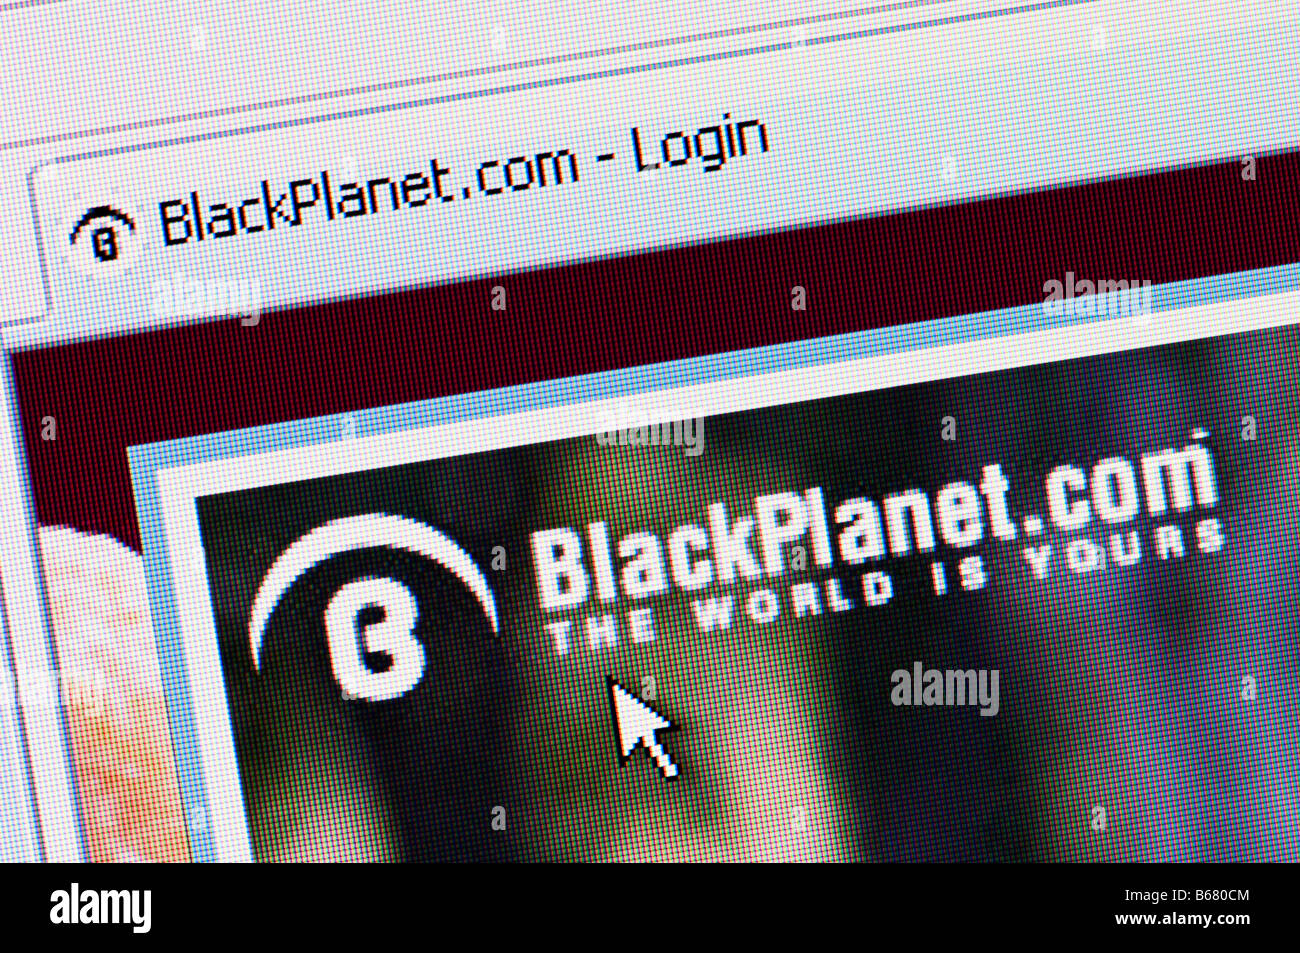 Com login blackplanet www Updating Your